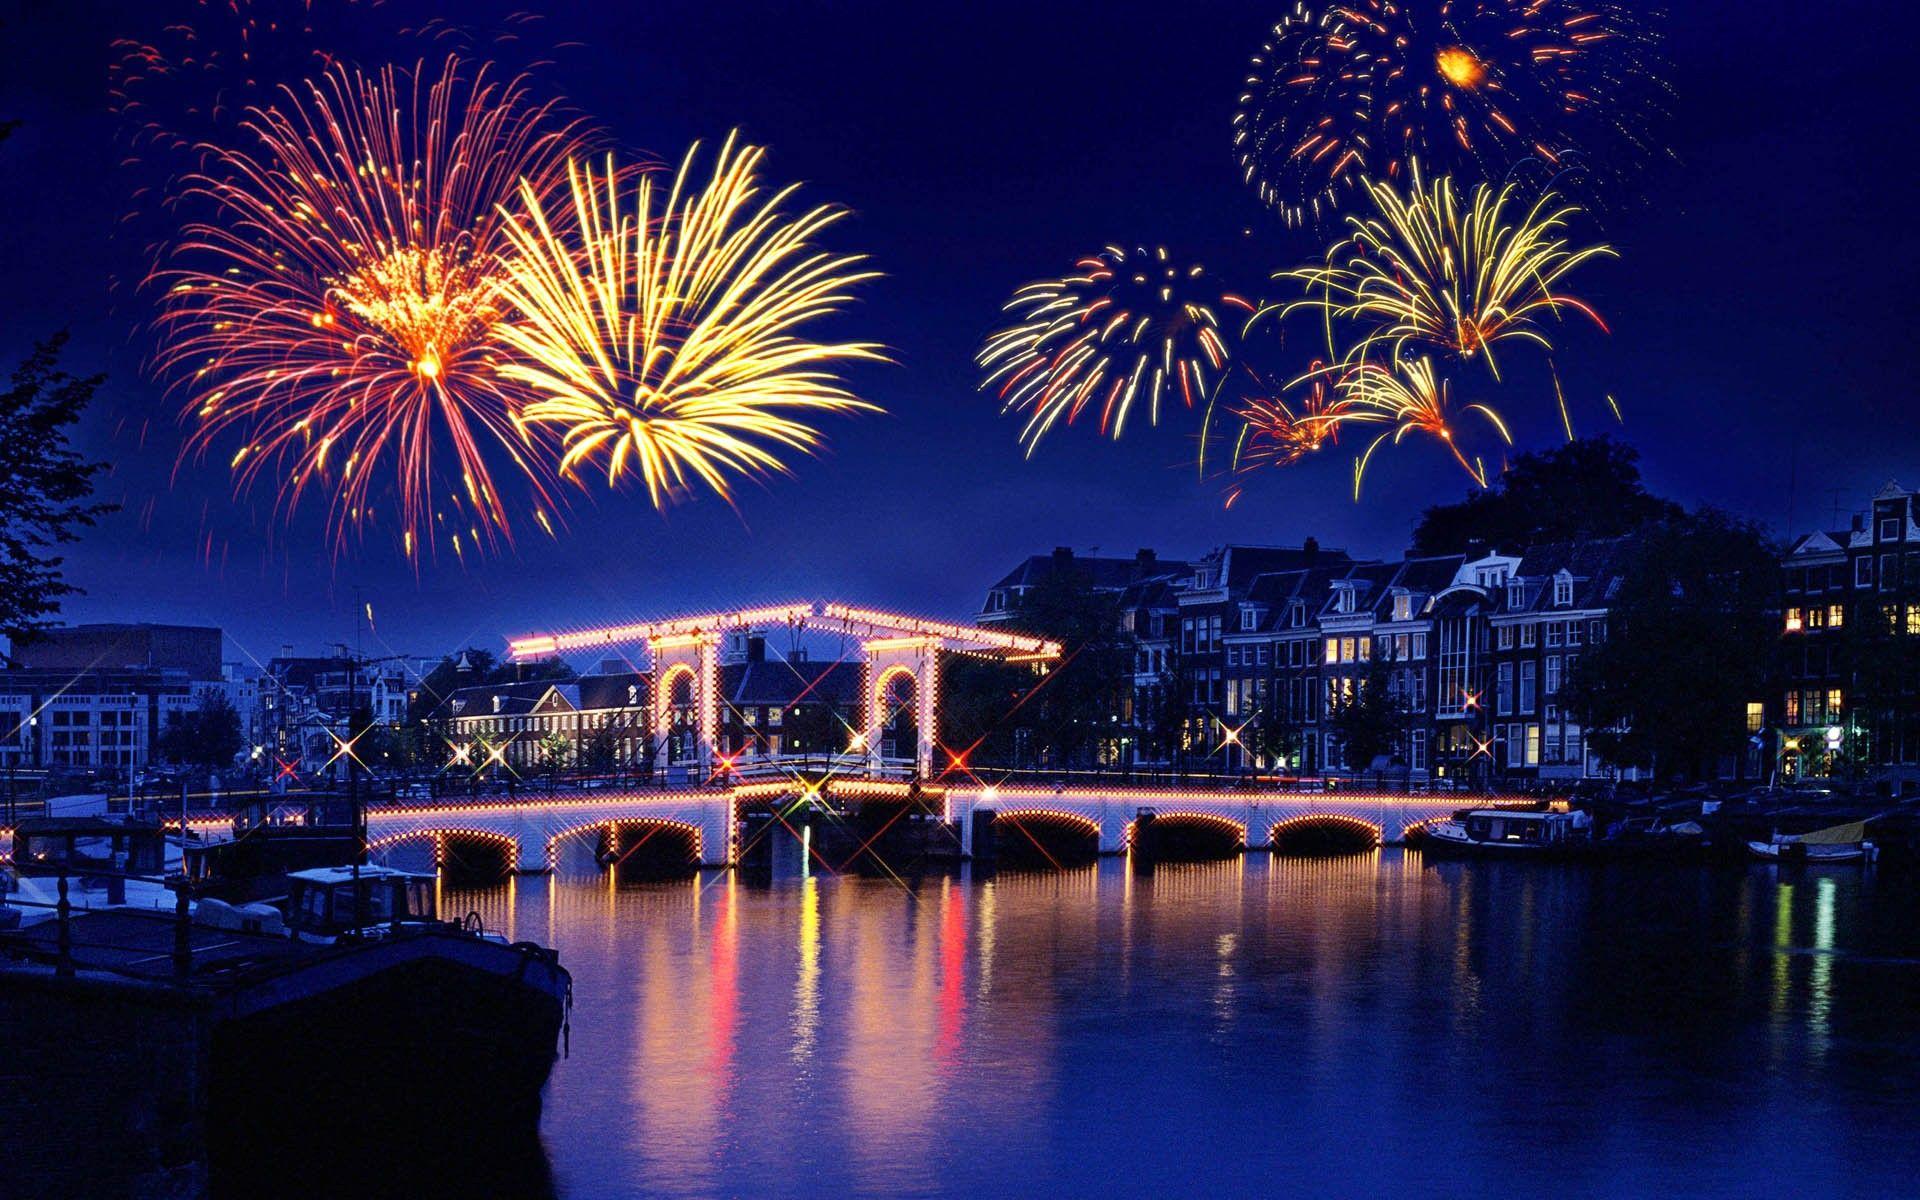 New Years Eve New Year Eve Cruises New Year Fireworks New Year Wallpaper Happy New Year Wallpaper